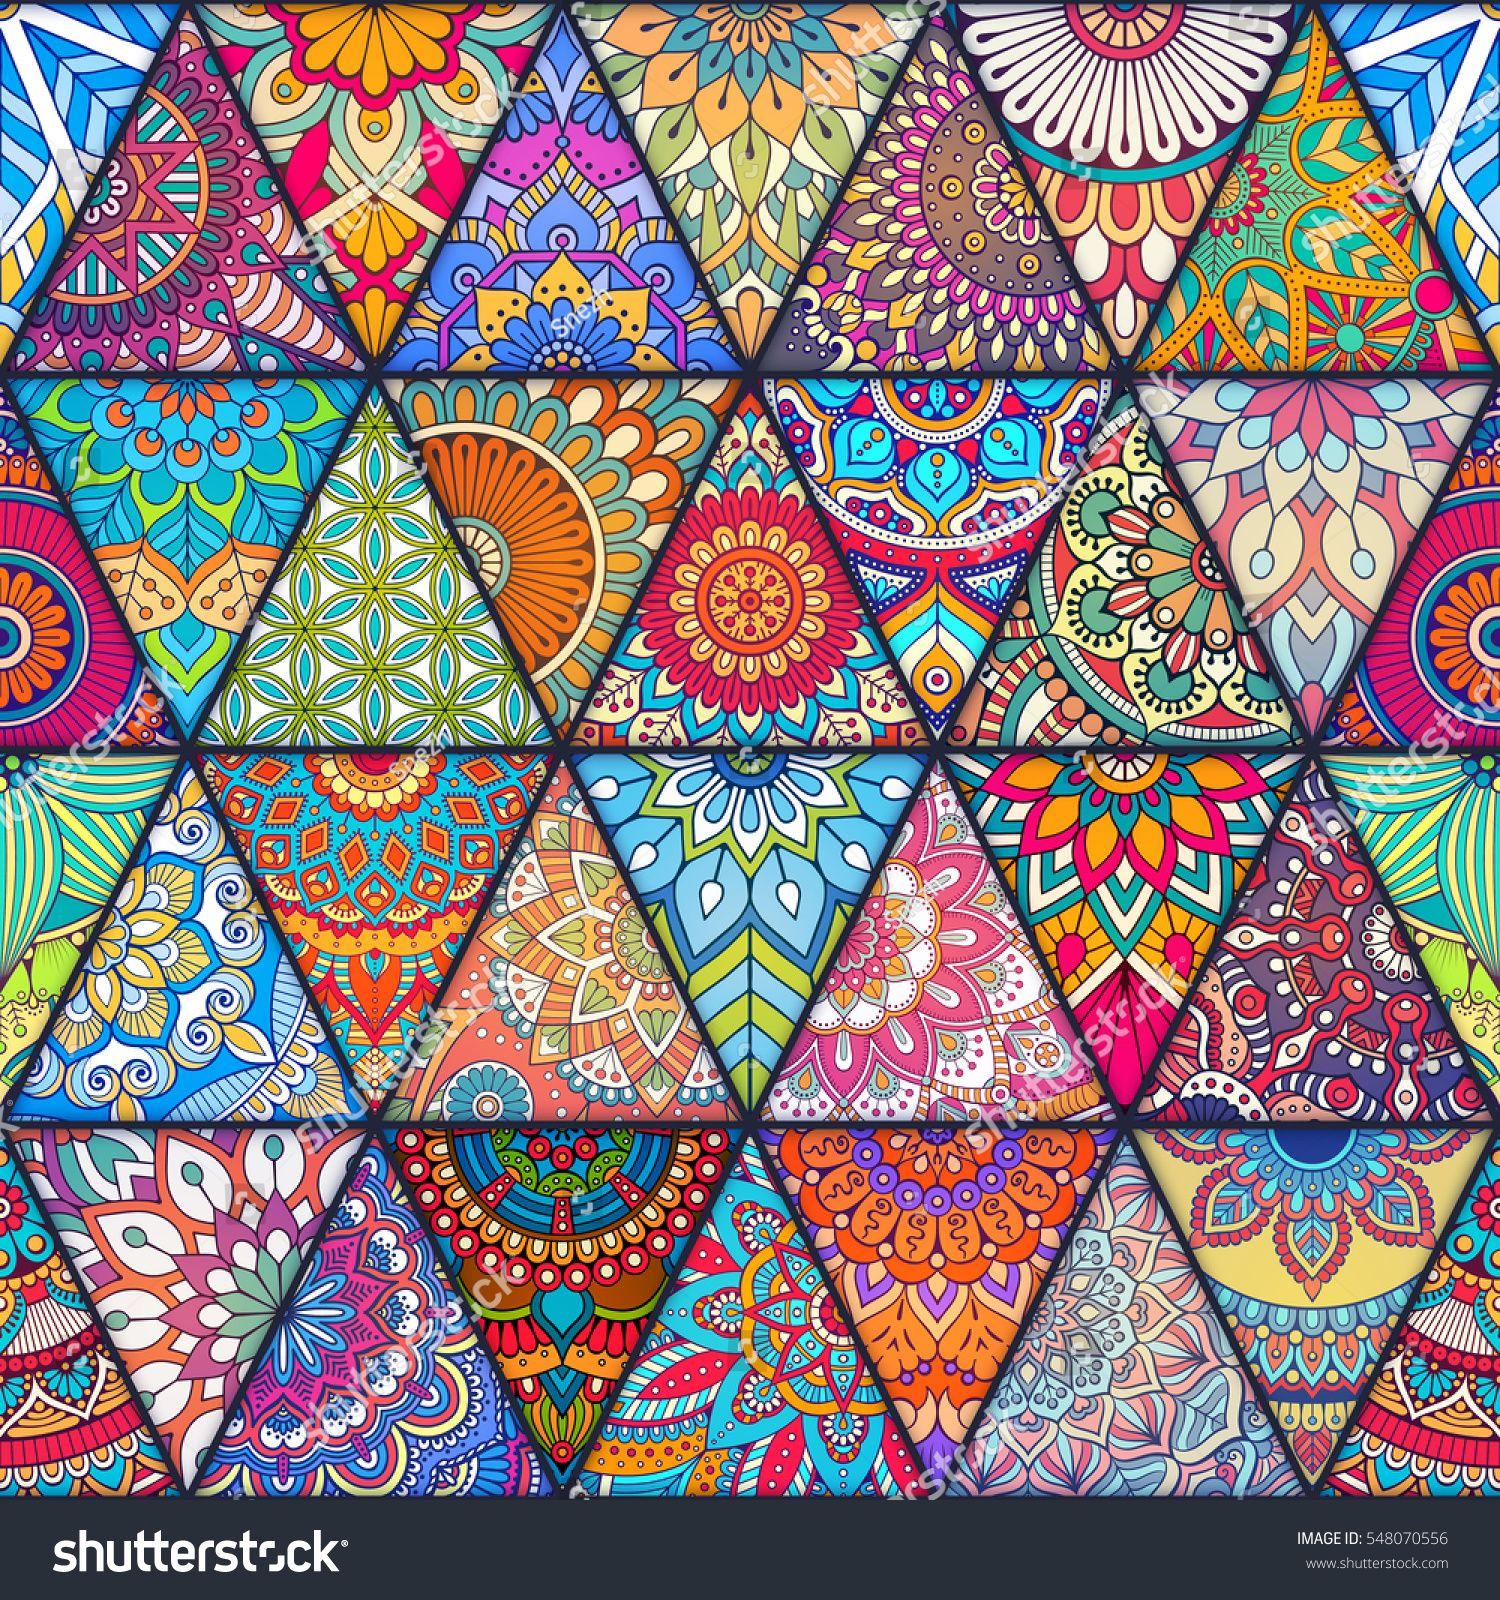 Seamless Mandalas Pattern Vintage Decorative Elements With Mandala Hand Drawn Mandala Background Islam Arabic Vintage Art Prints Mandala Background Prints